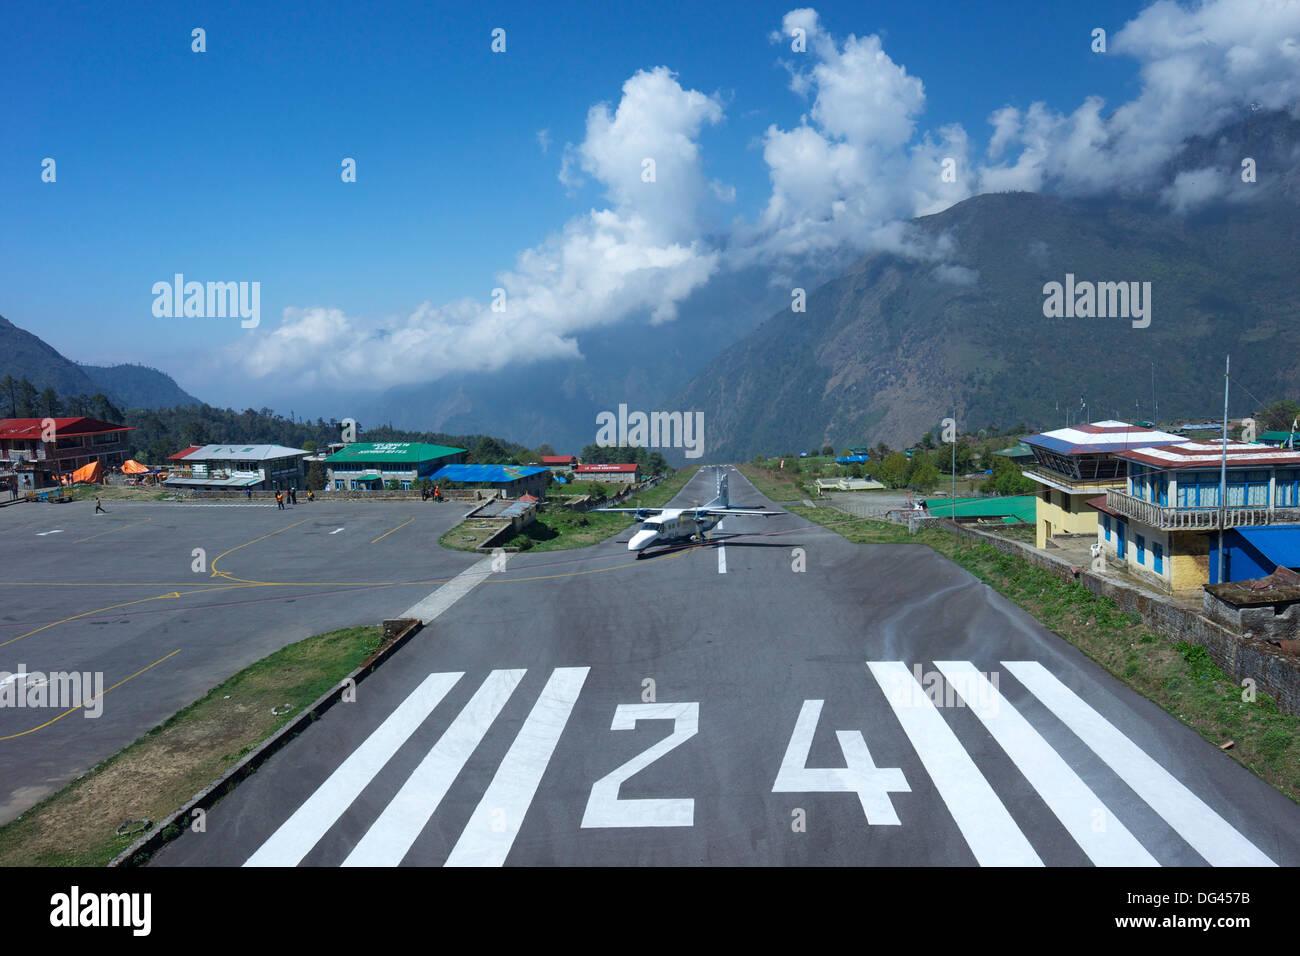 Sita Air Dornier 228 airplane landing on runway, Tenzing-Hillary Airport, Lukla, Nepal, Asia - Stock Image